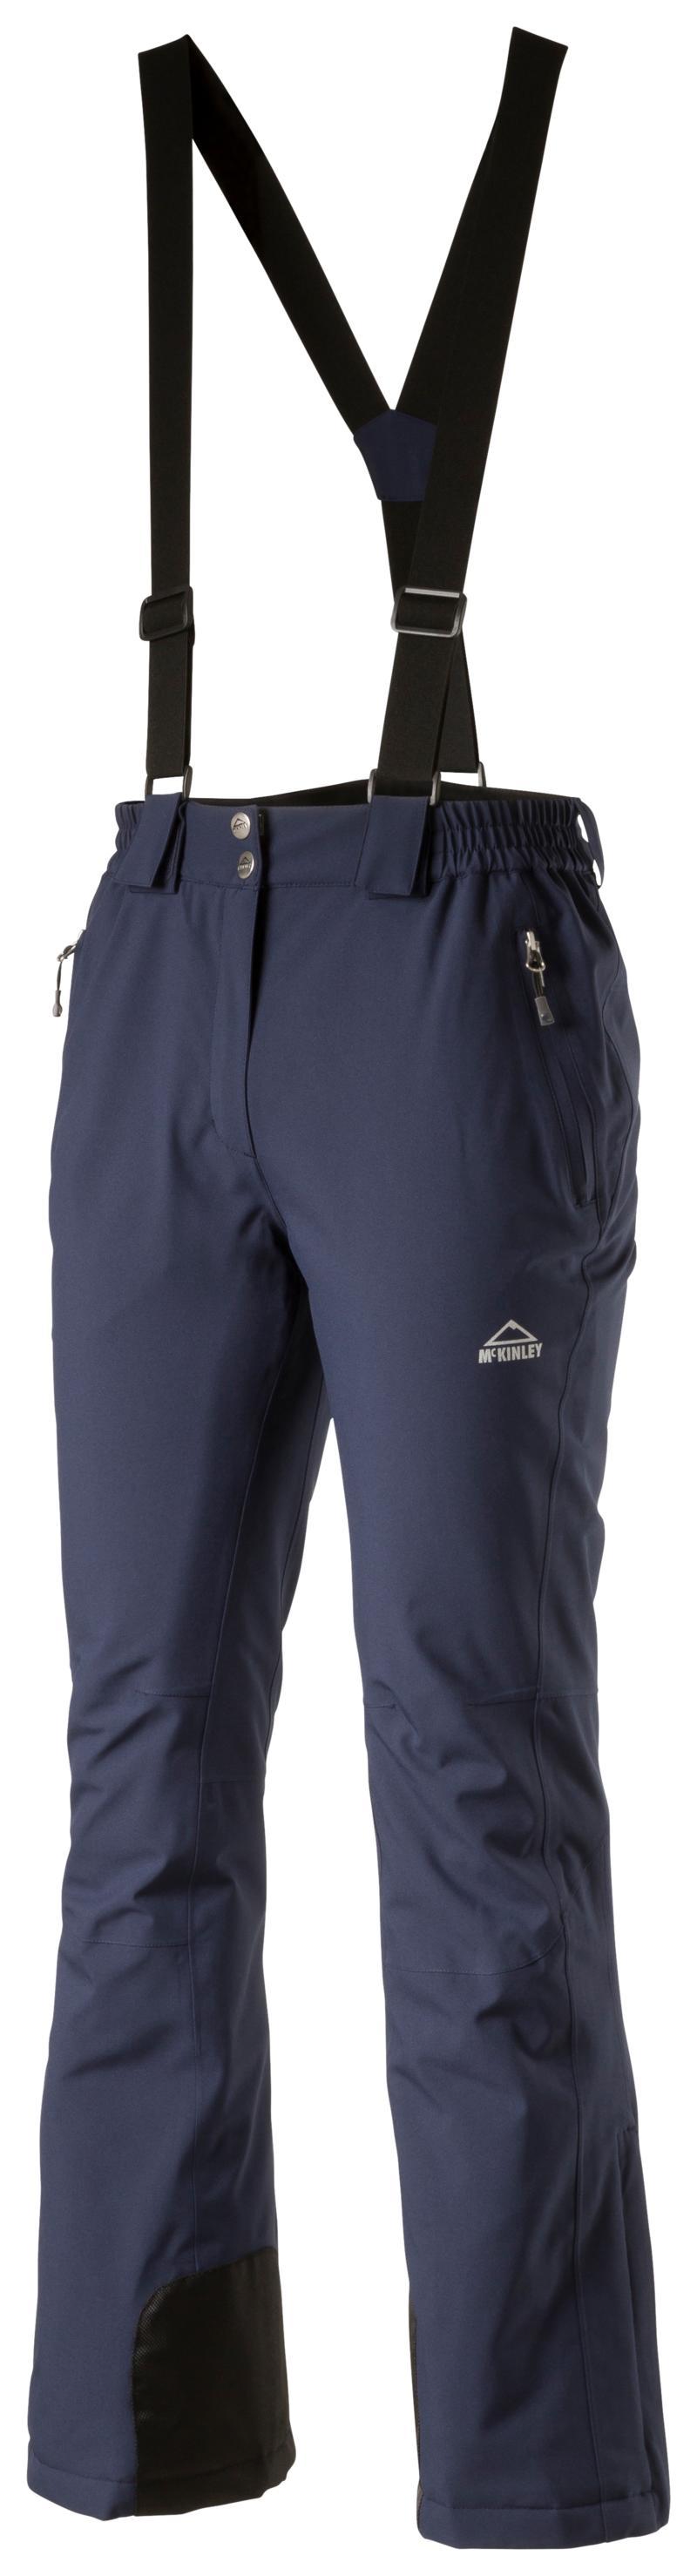 McKinley STELLA II STR WMS, ženske skijaške hlače, plava